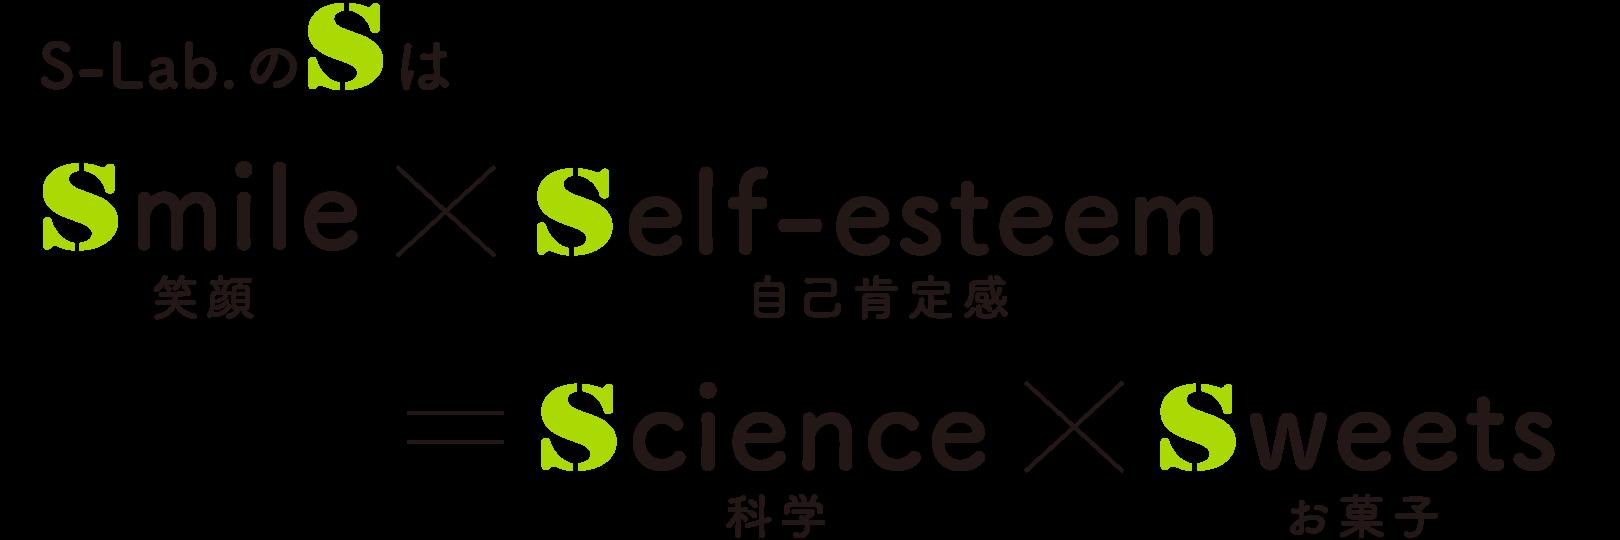 S-Lab.のSはSmile×Self-esteem=Science×Sweets